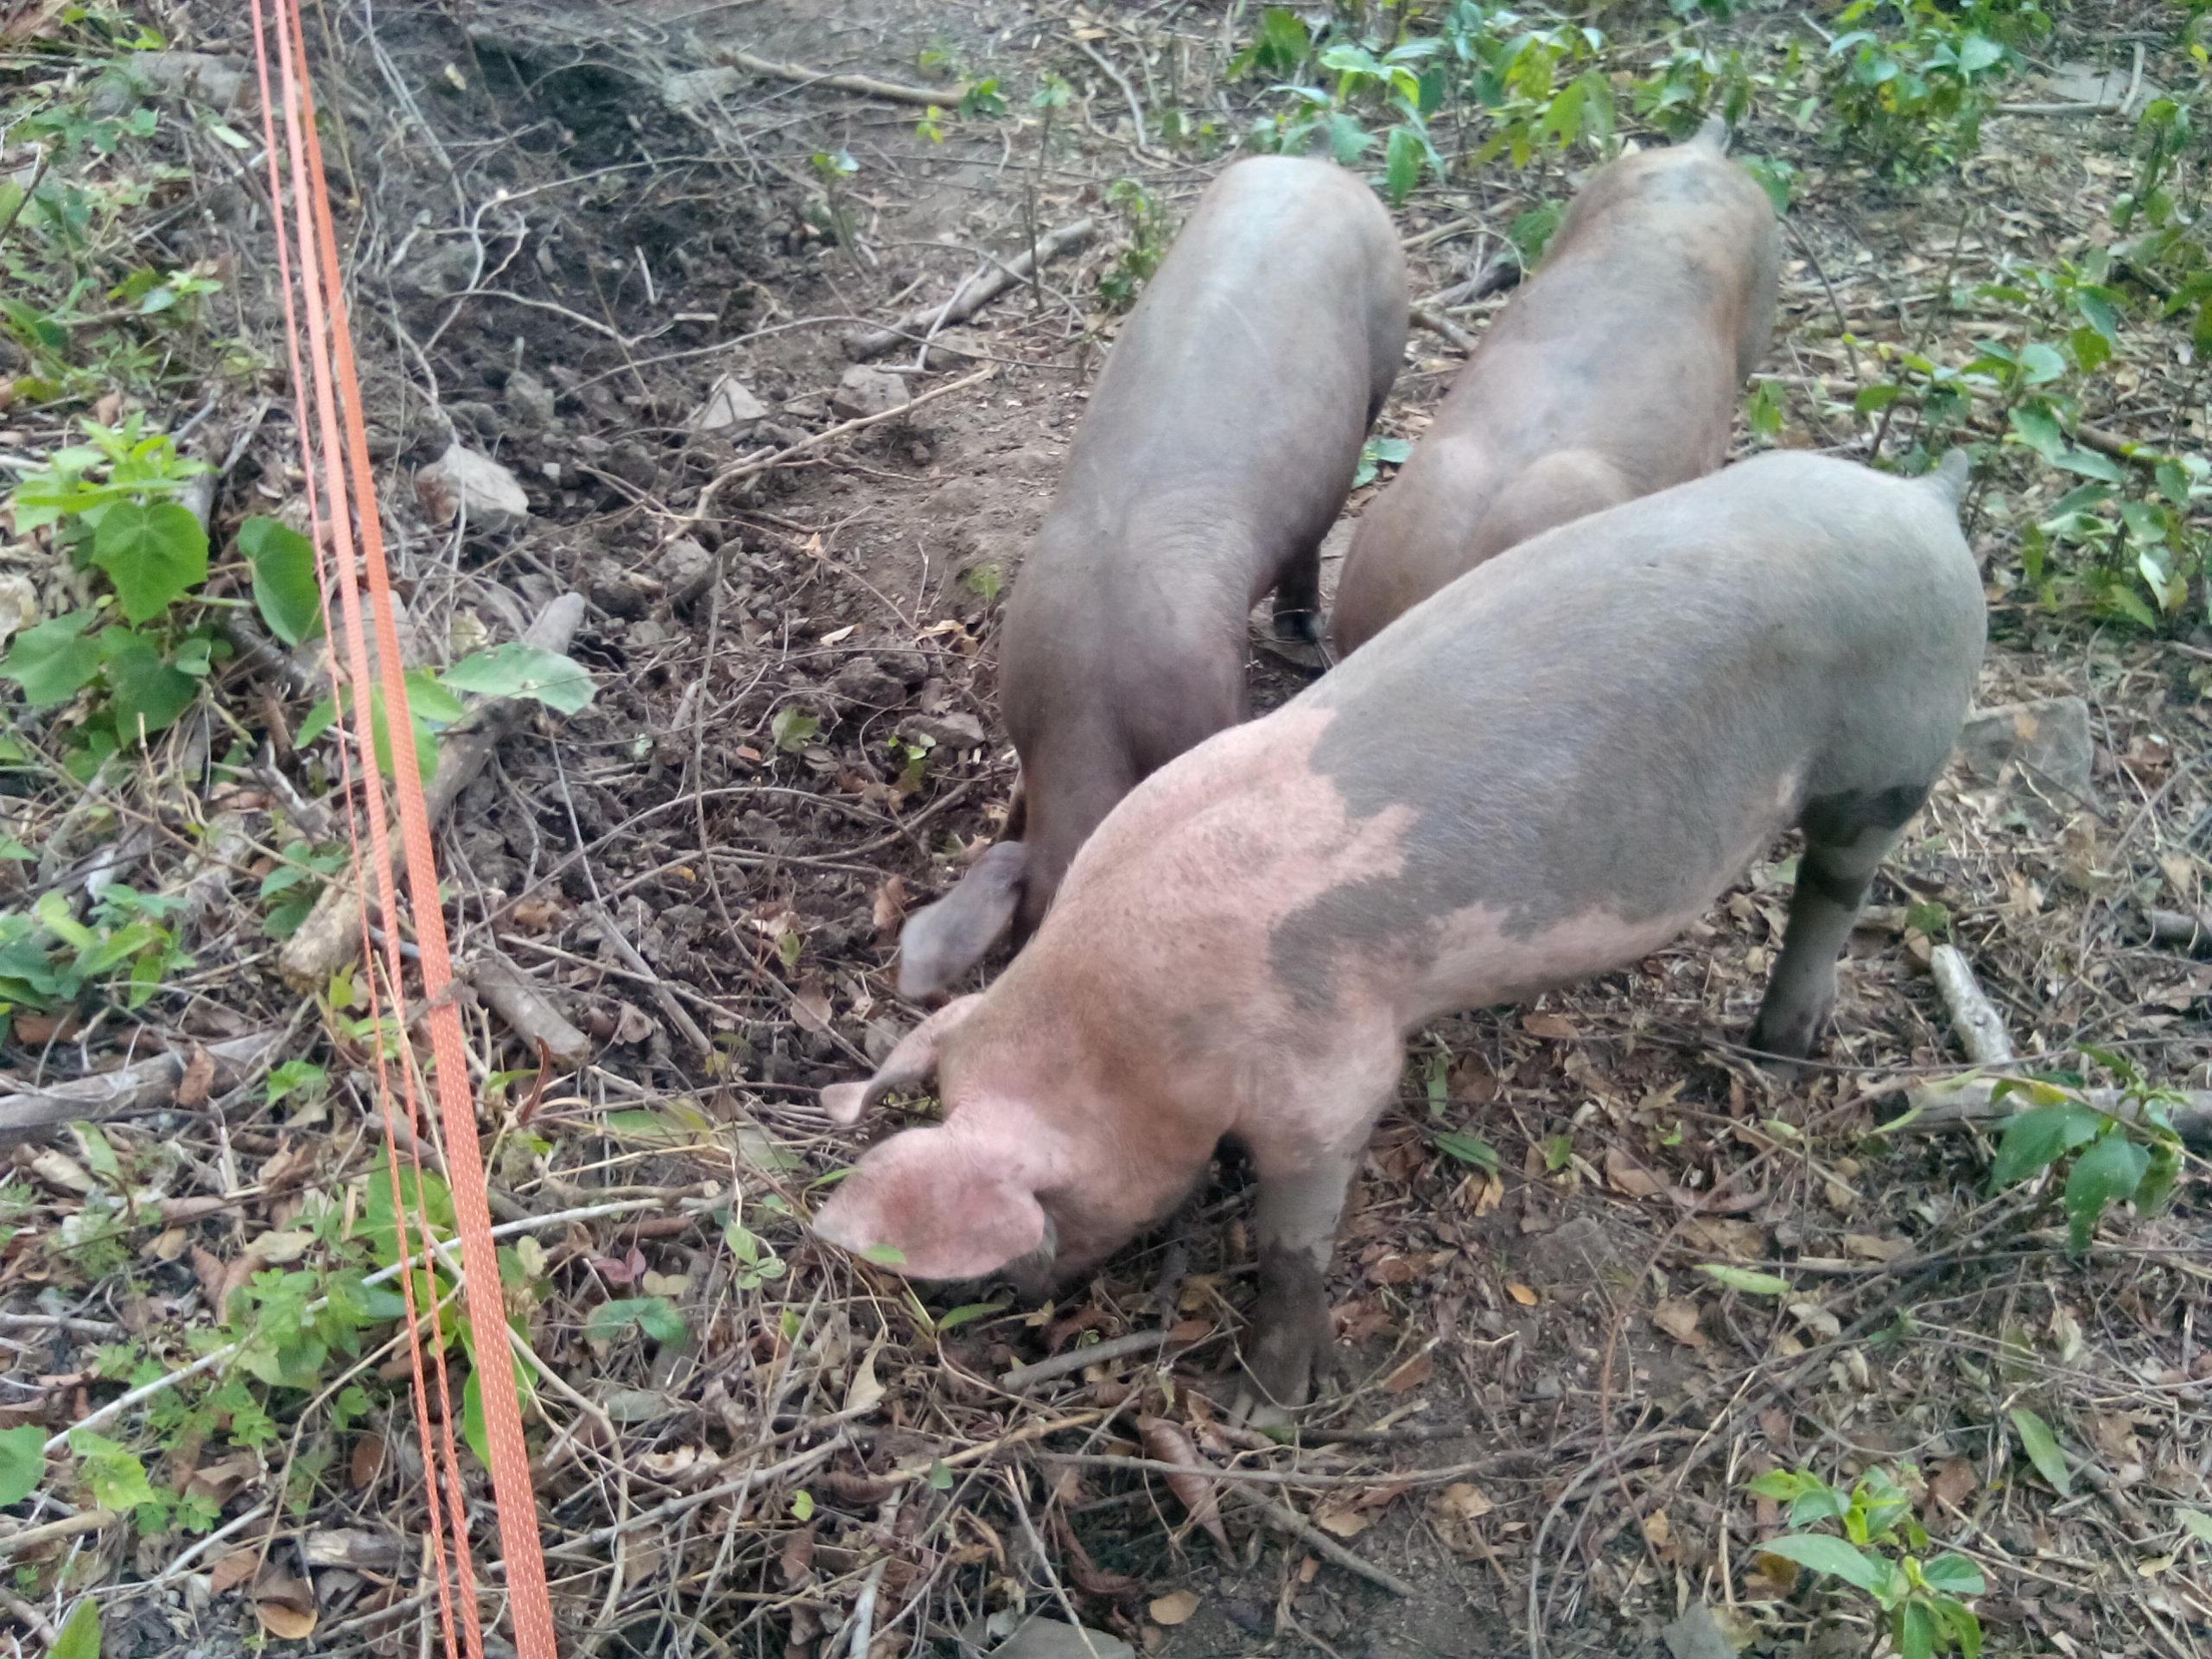 forrester pig new farms livestock pasture shop pigs raised piglets feeder pork